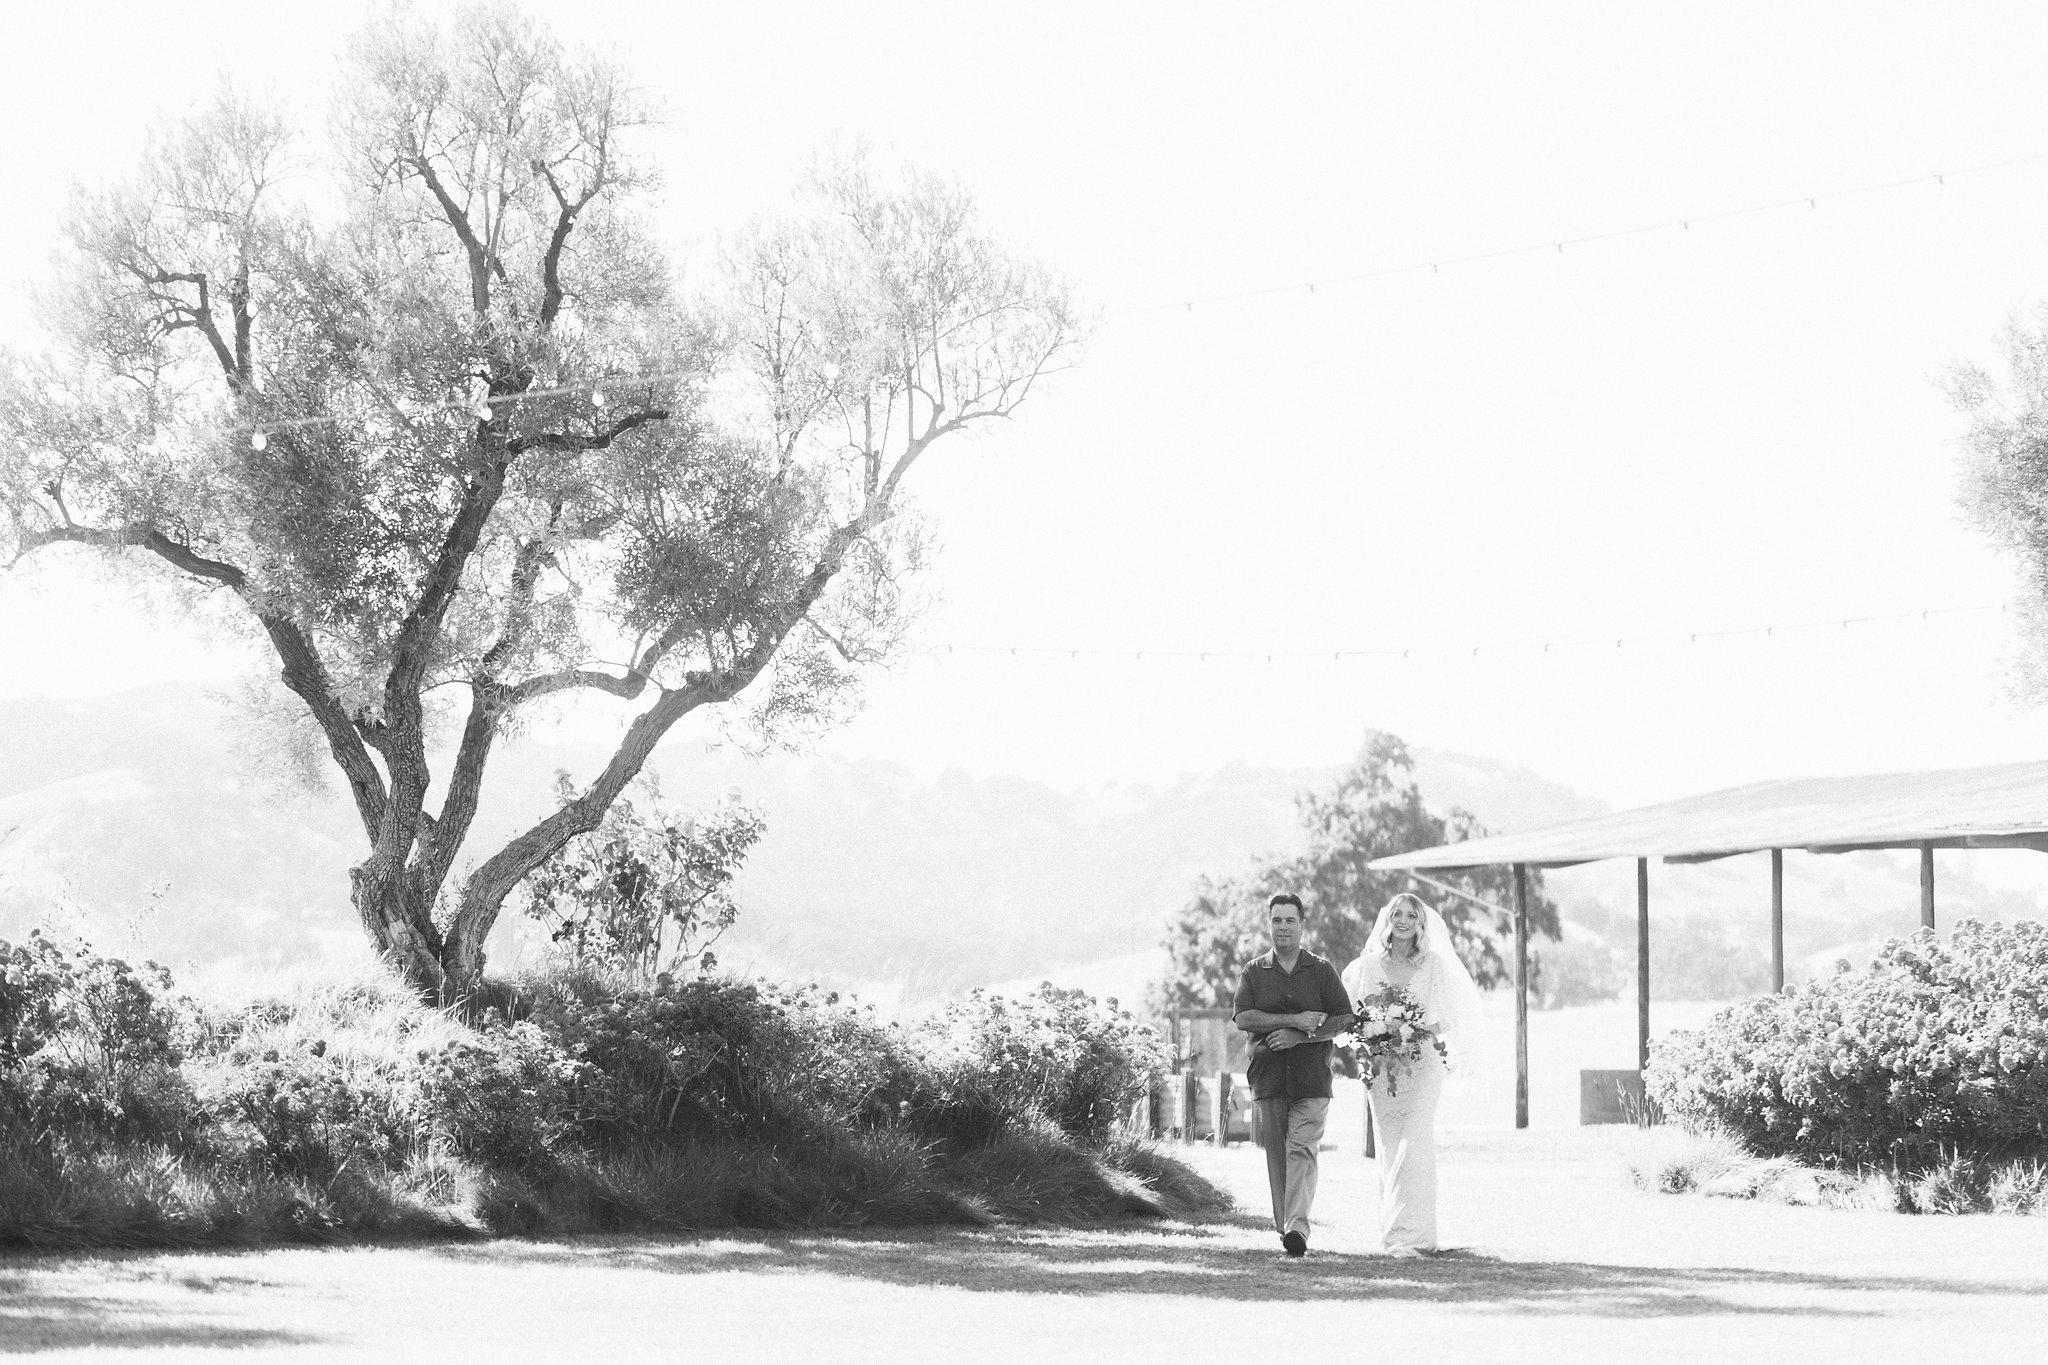 cameron_ingalls-santa_margarita_ranch-clark-0339.jpg